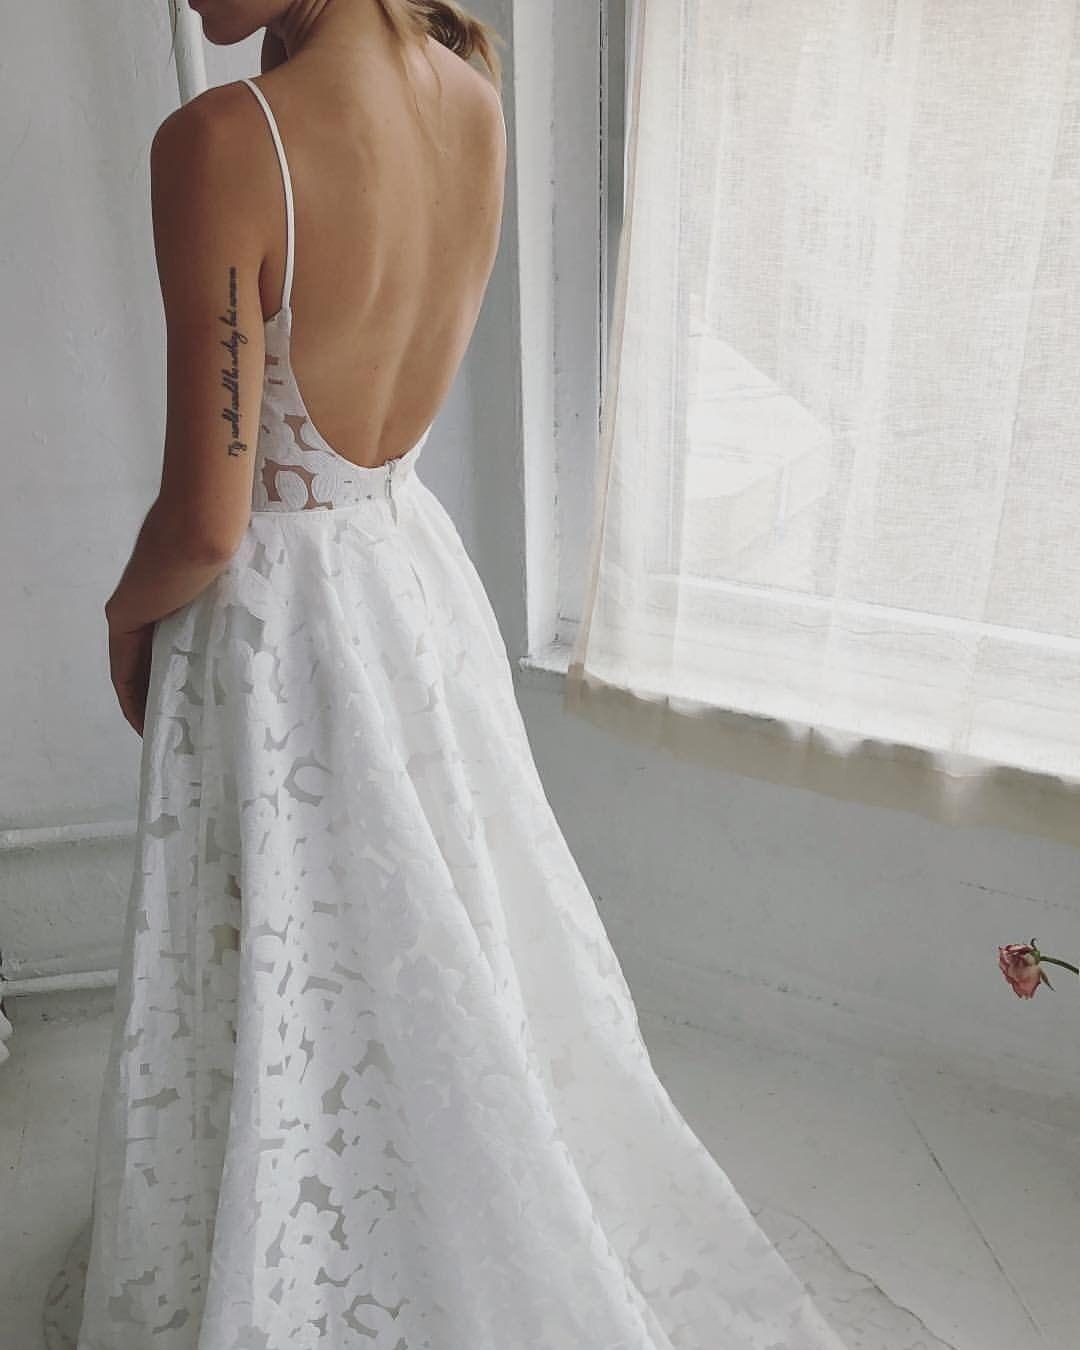 Annie By Truvelle Price 2 440 Summer Wedding Dress Modern Wedding Dress Dresses [ 1350 x 1080 Pixel ]